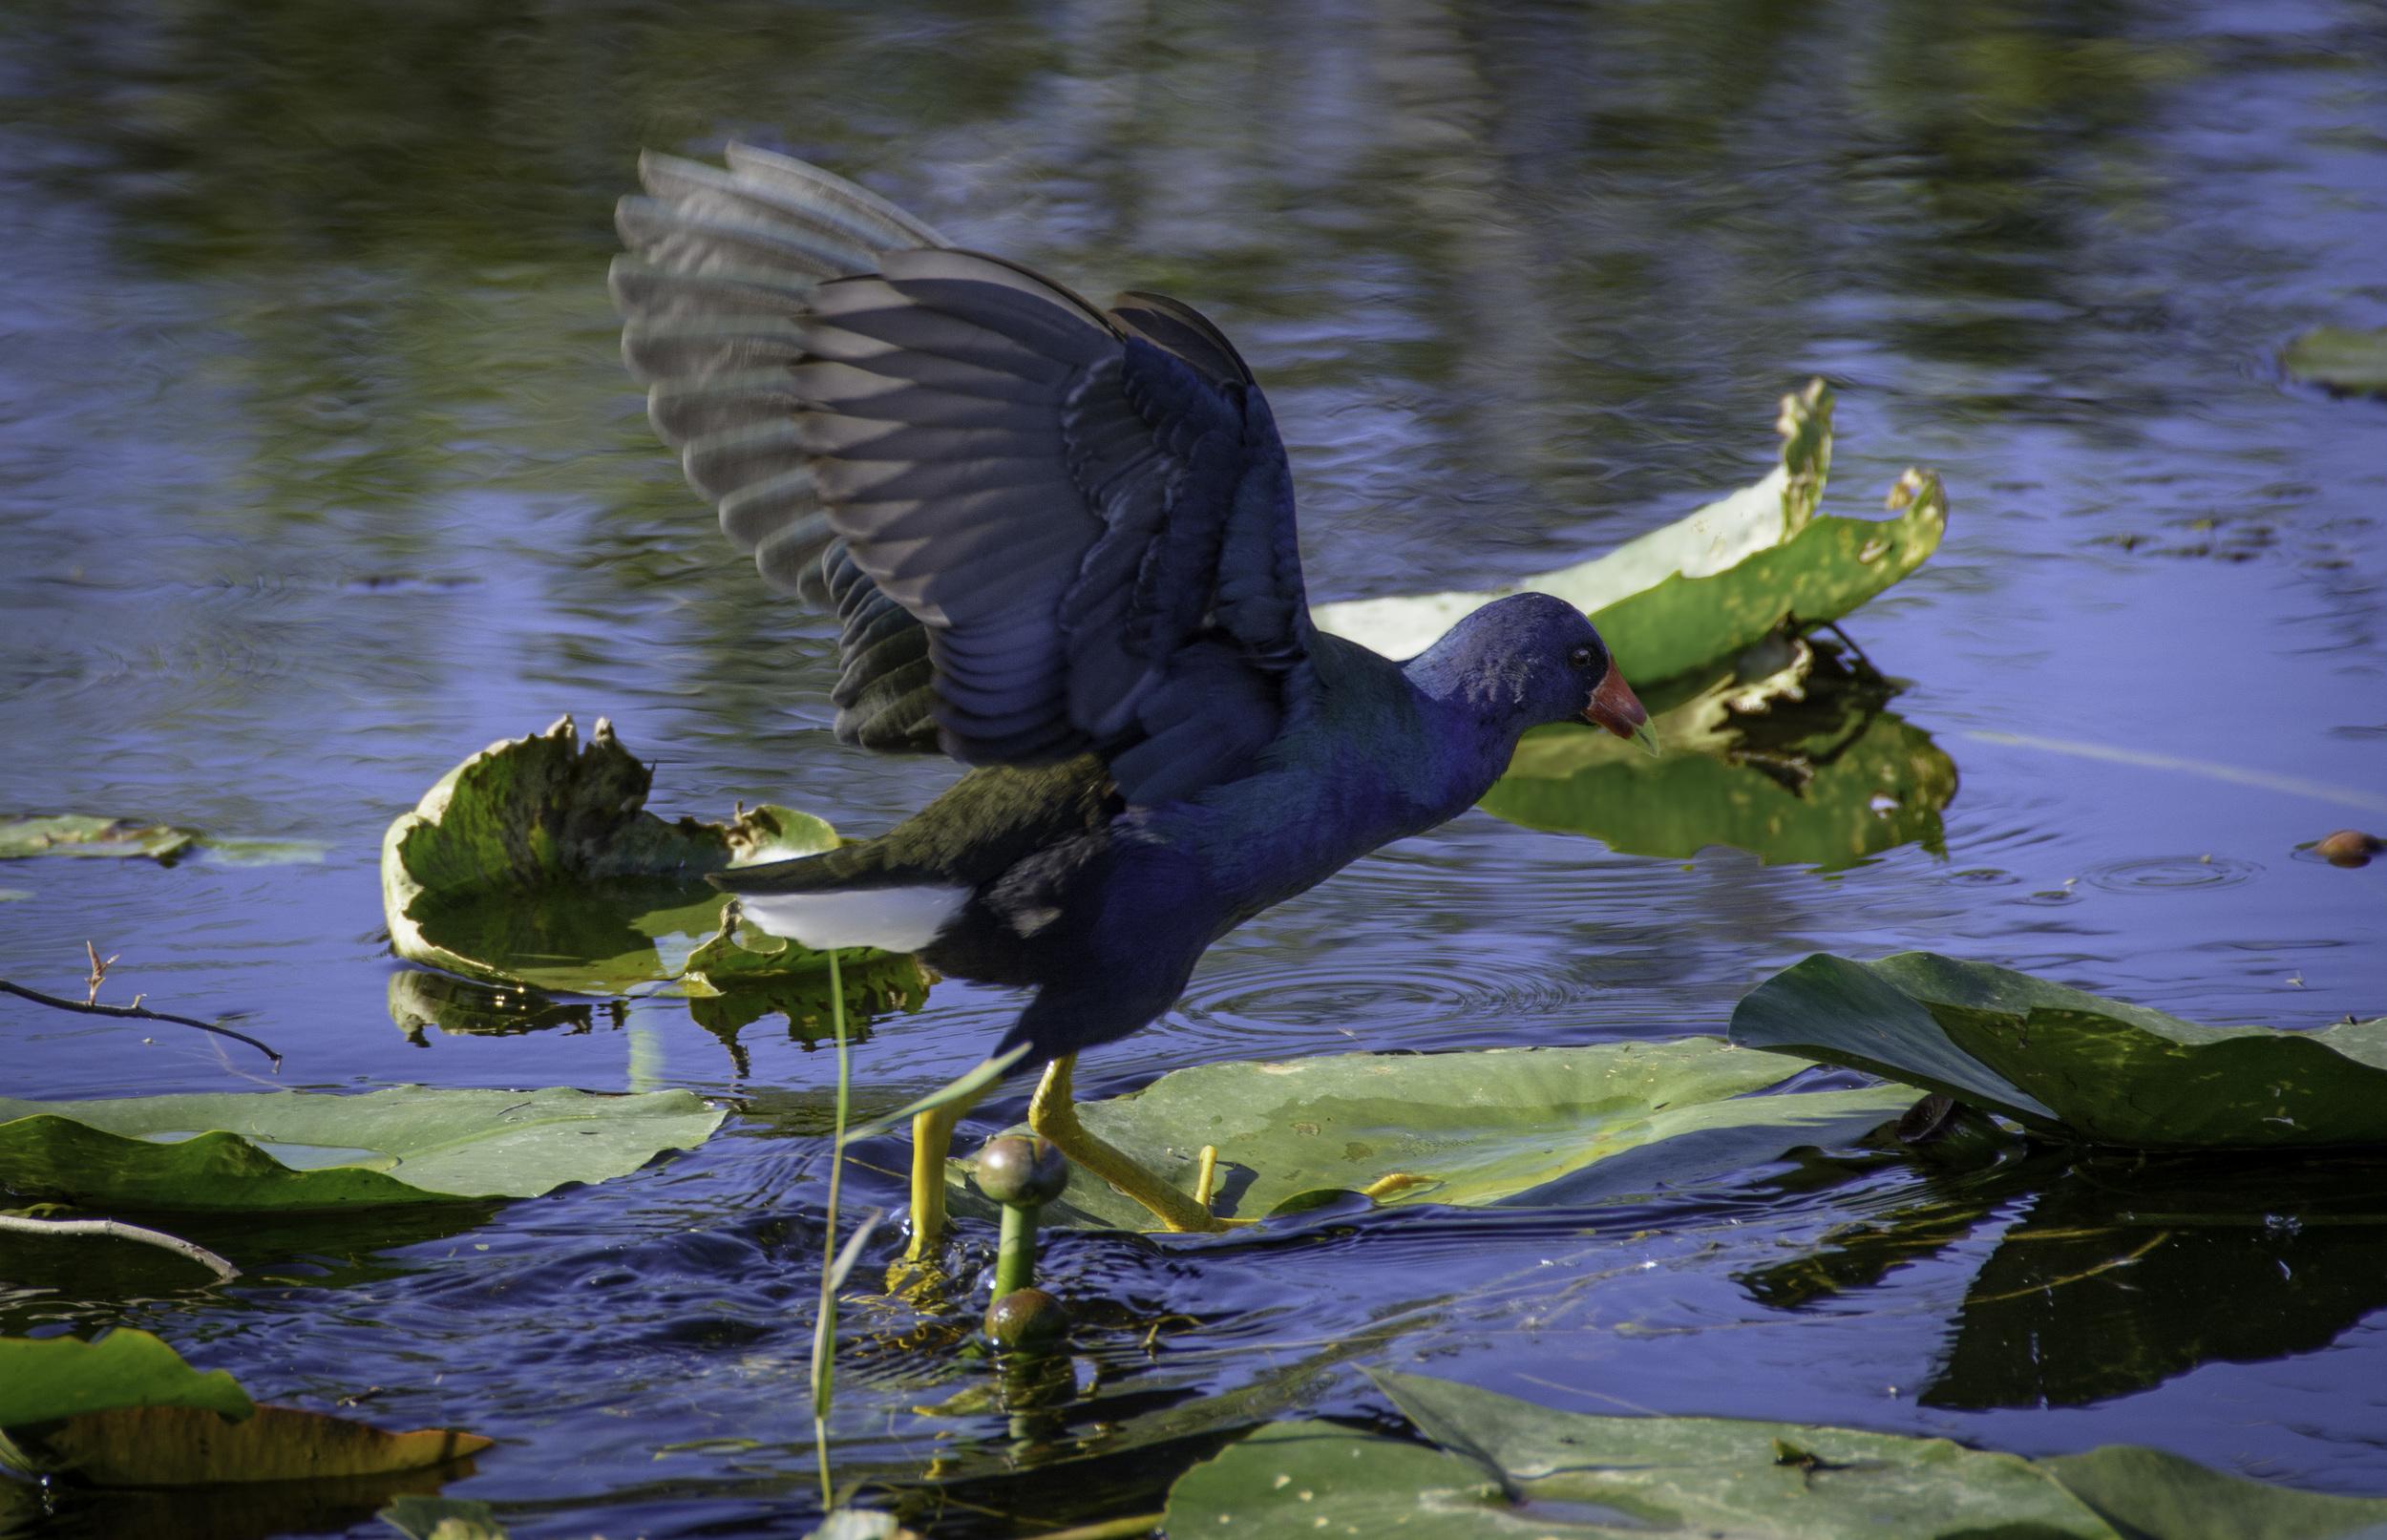 Everglades_20140217_013.jpg